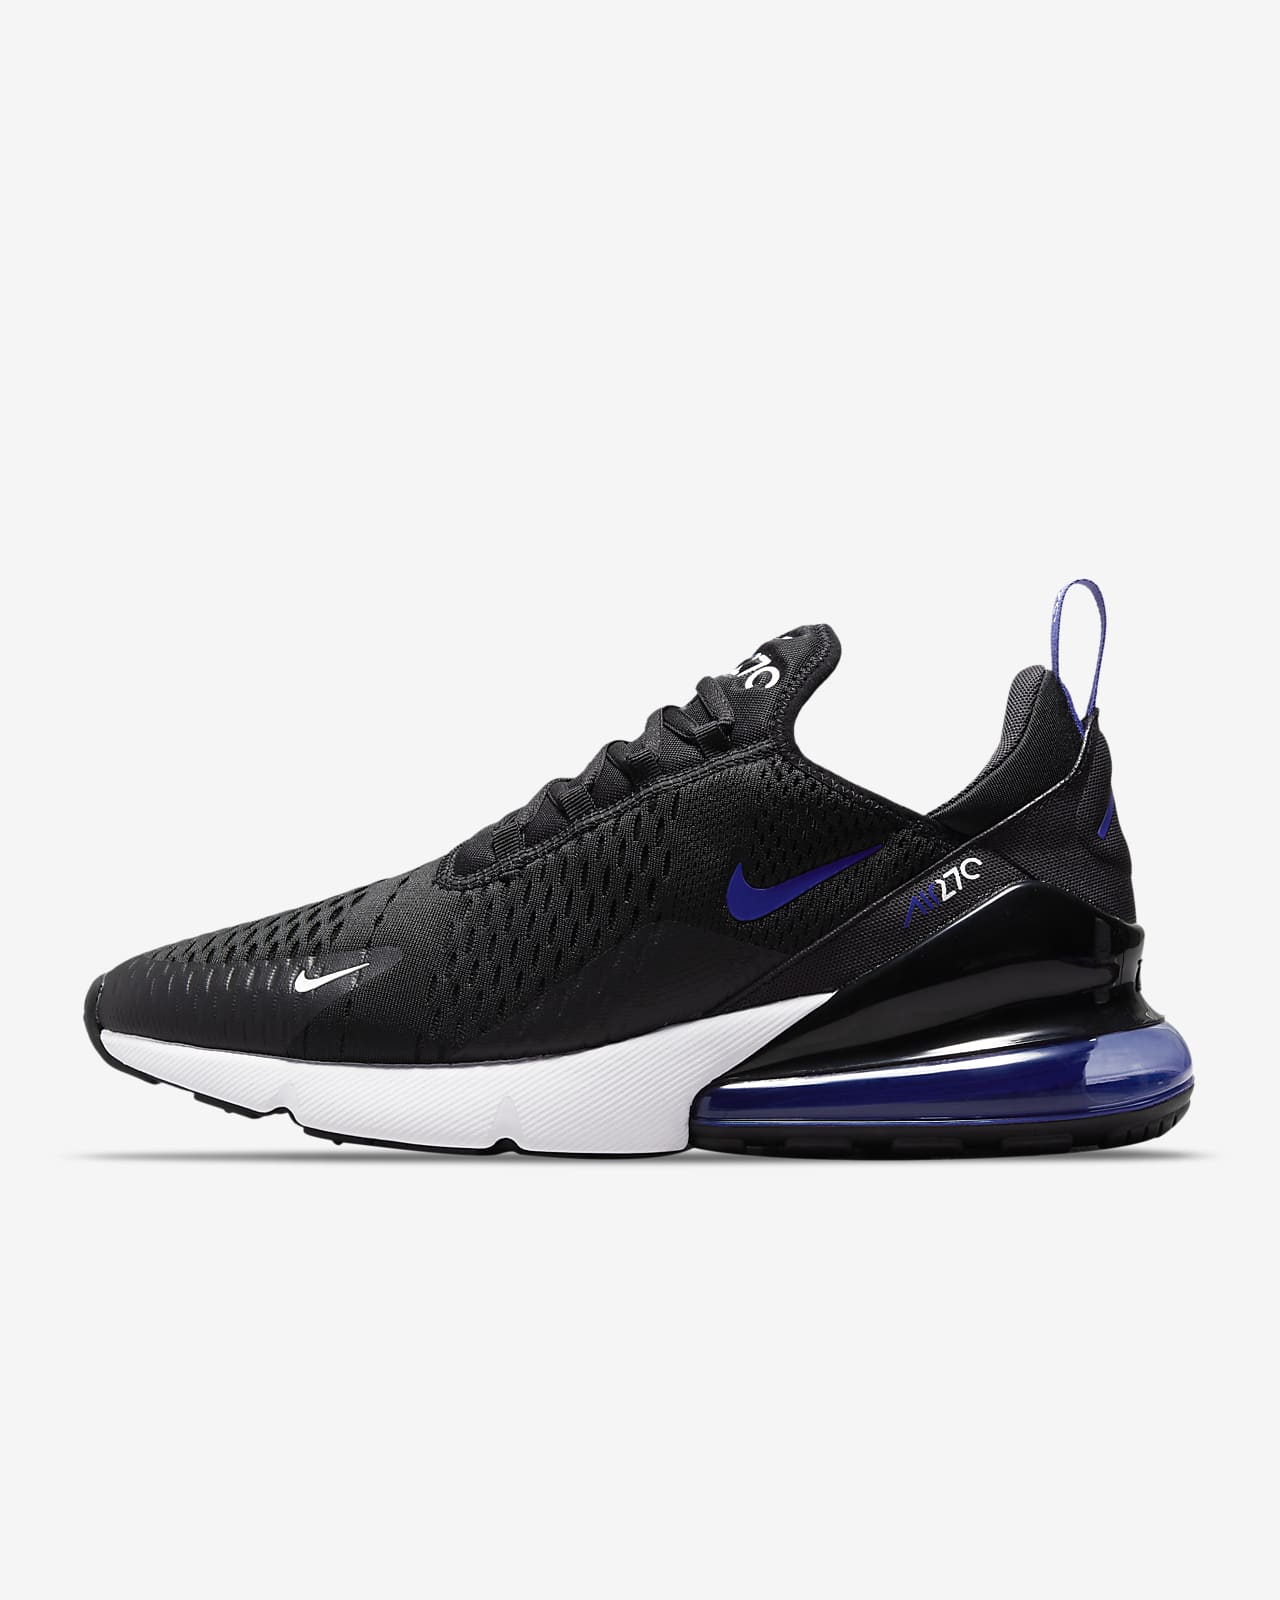 Chaussure Nike Air Max270 Essential pour Homme